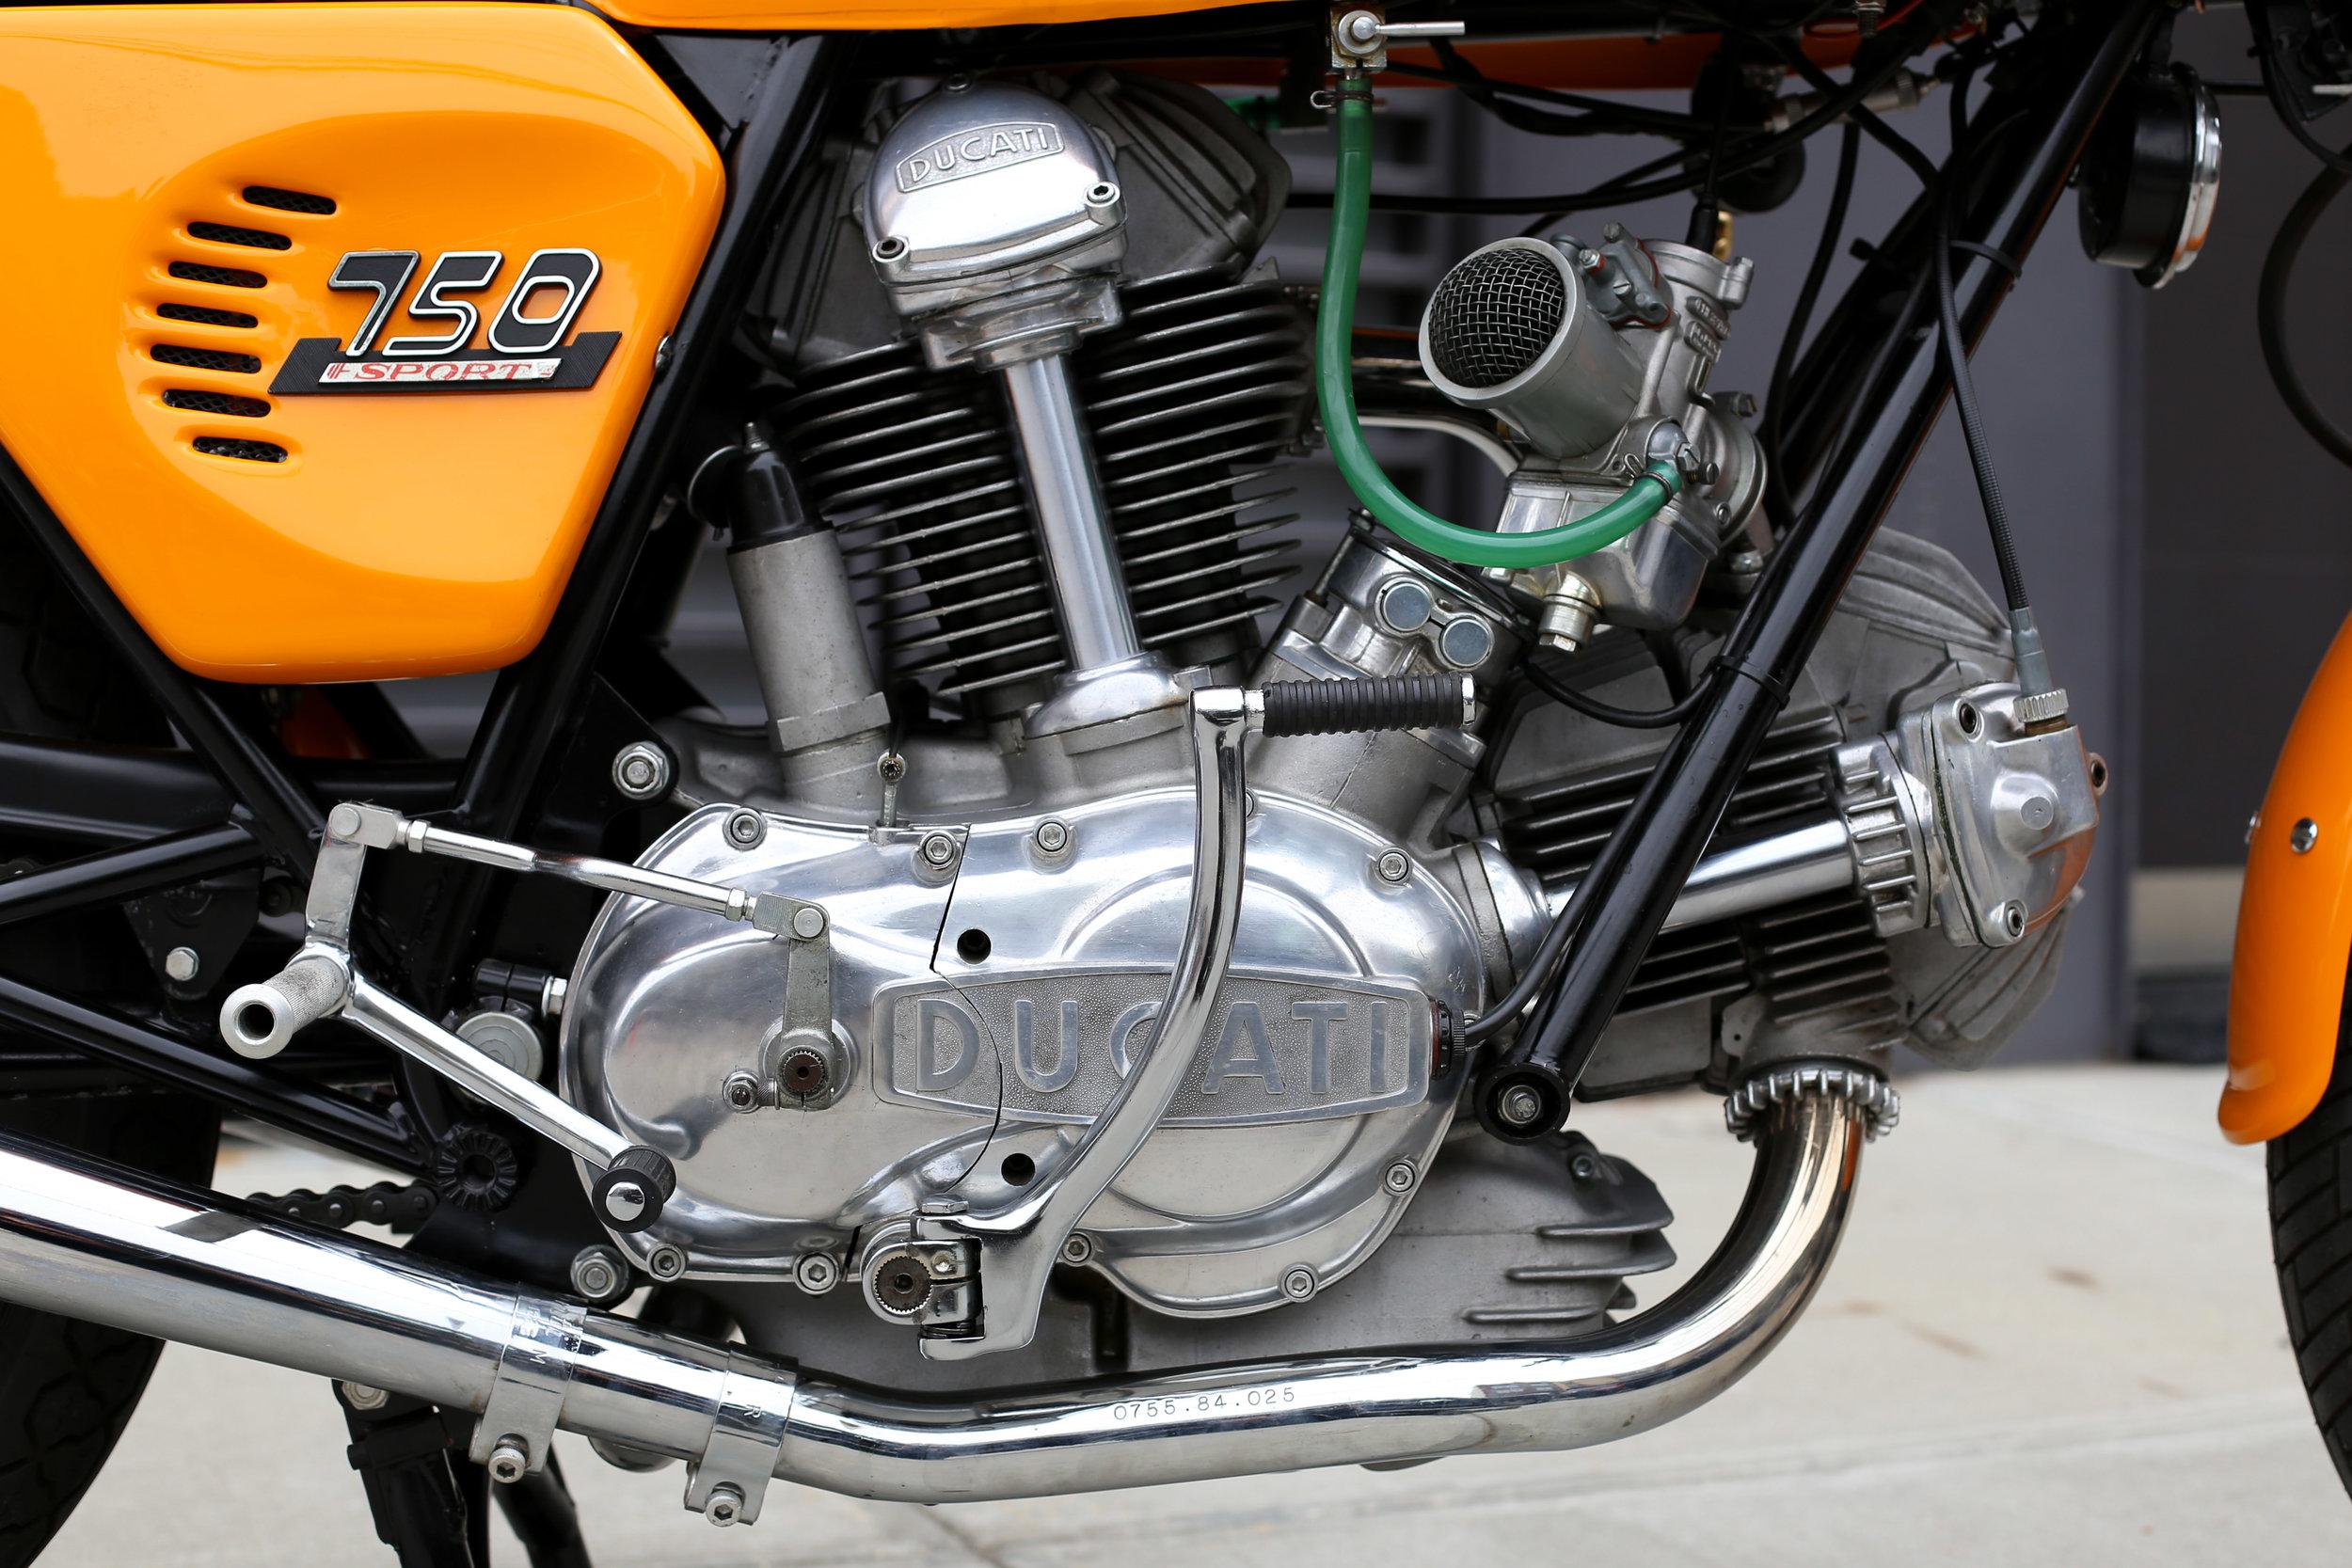 1974 Ducati 750S Motor